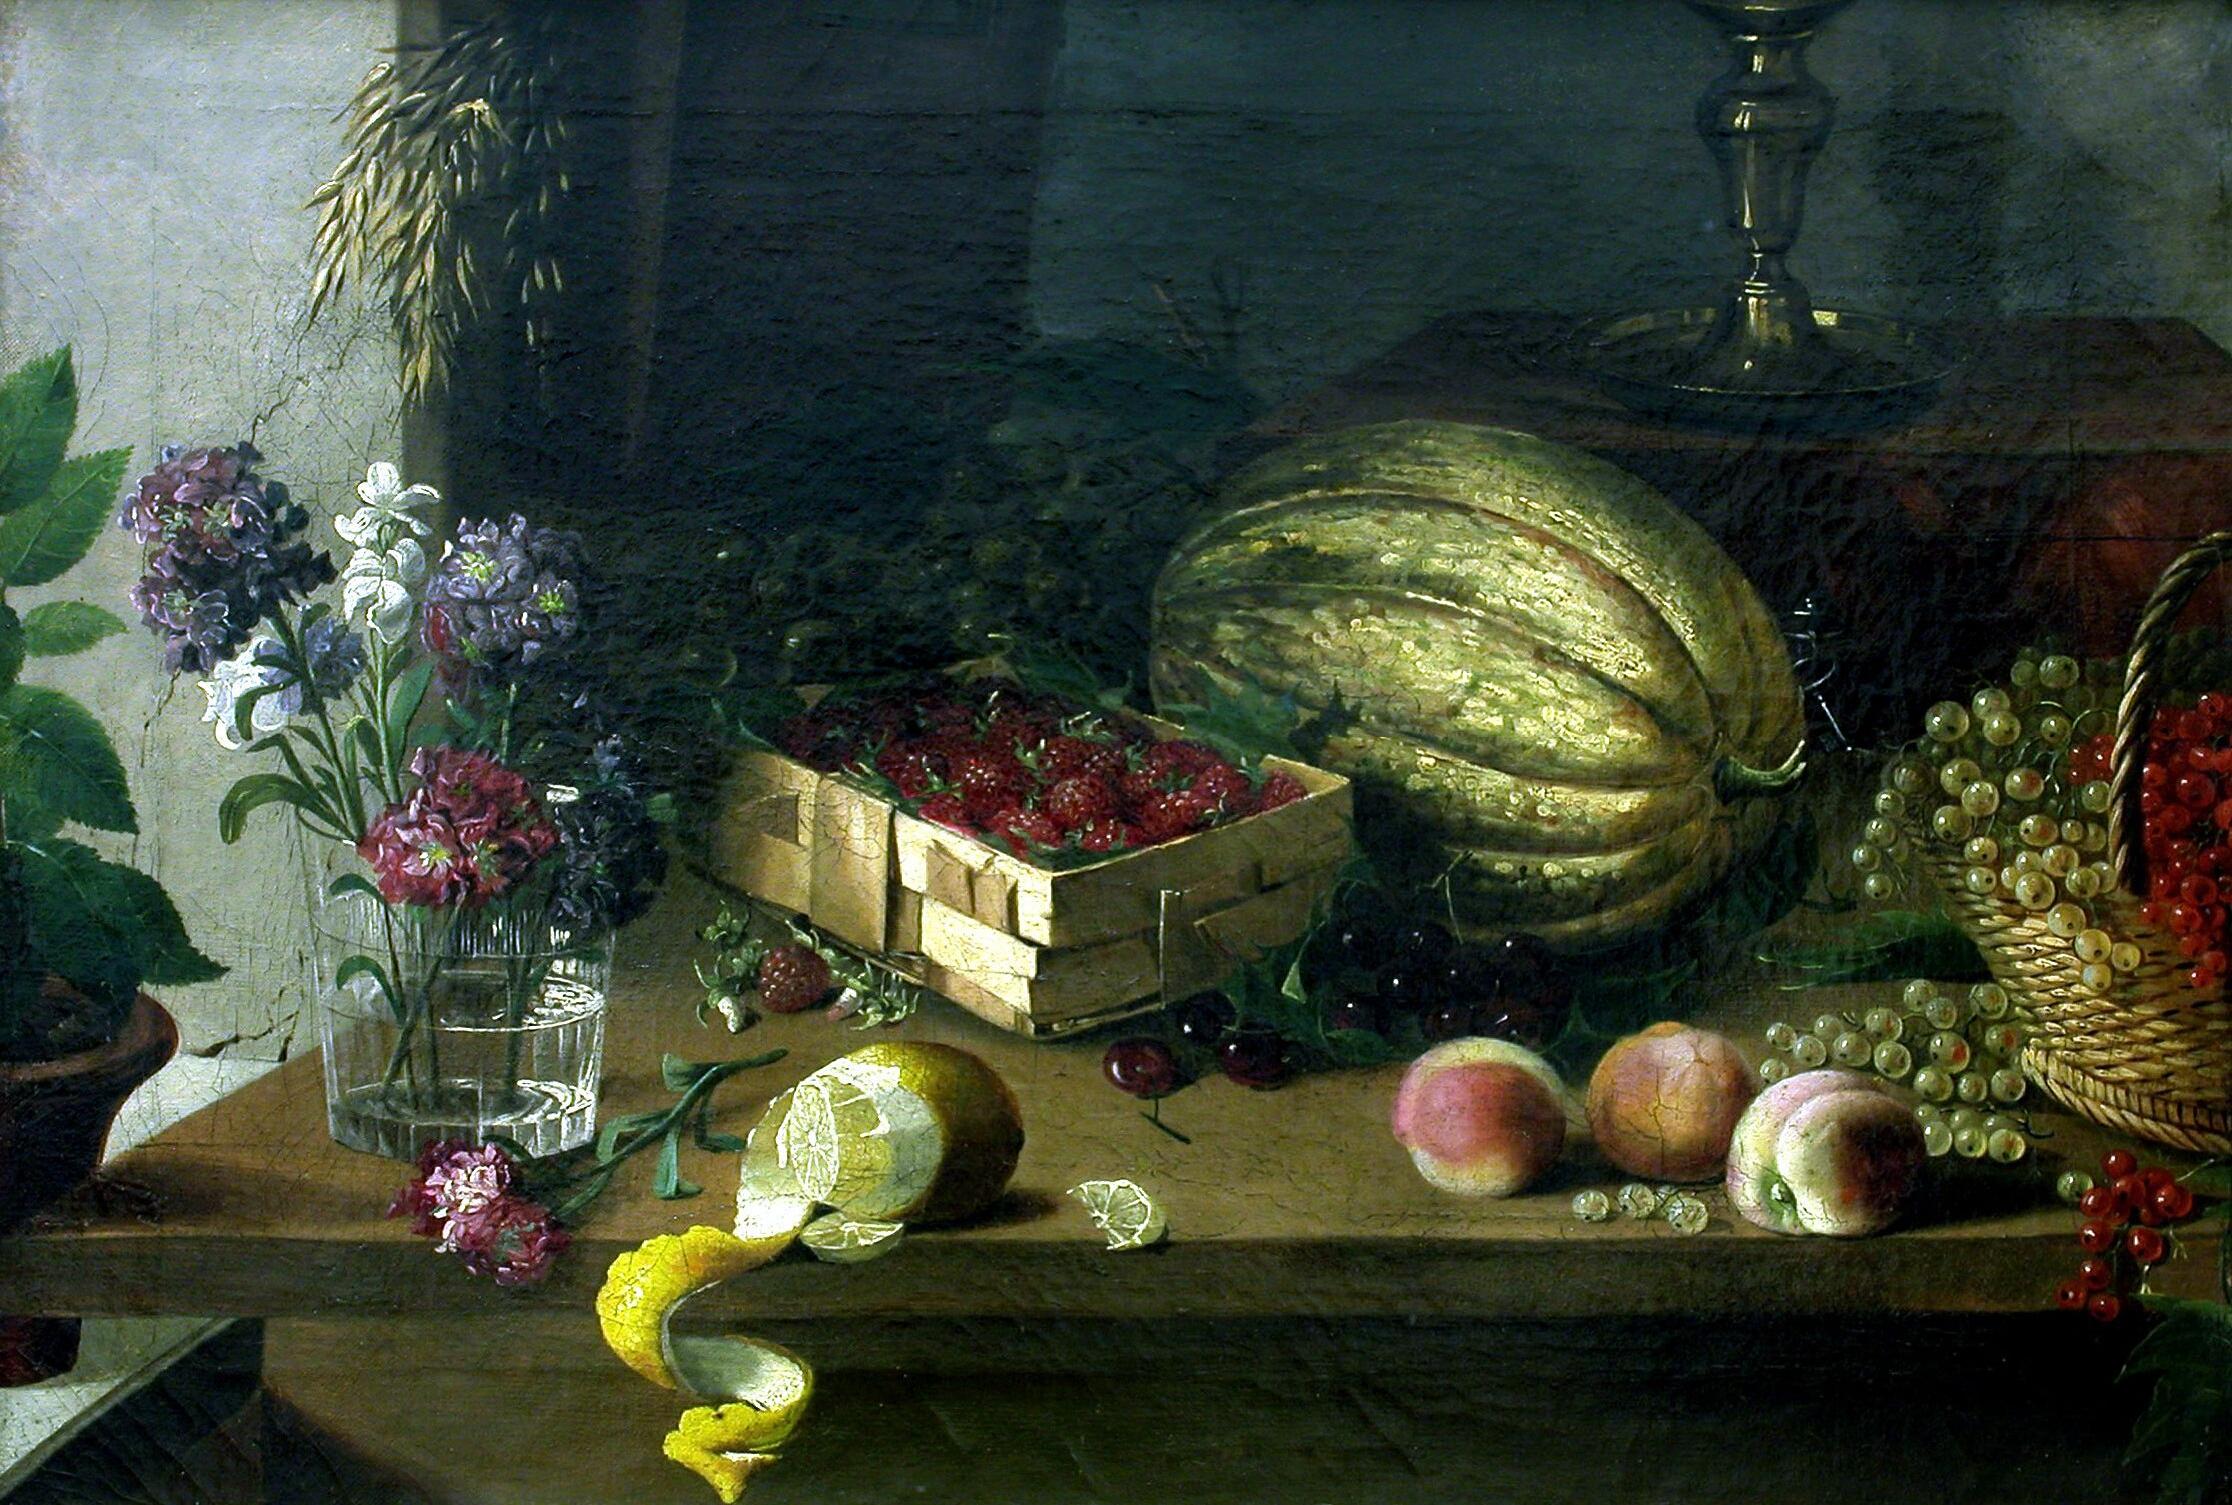 Картина хруцкого цветы и плоды ...: pictures11.ru/kartina-hruckogo-cvety-i-plody.html